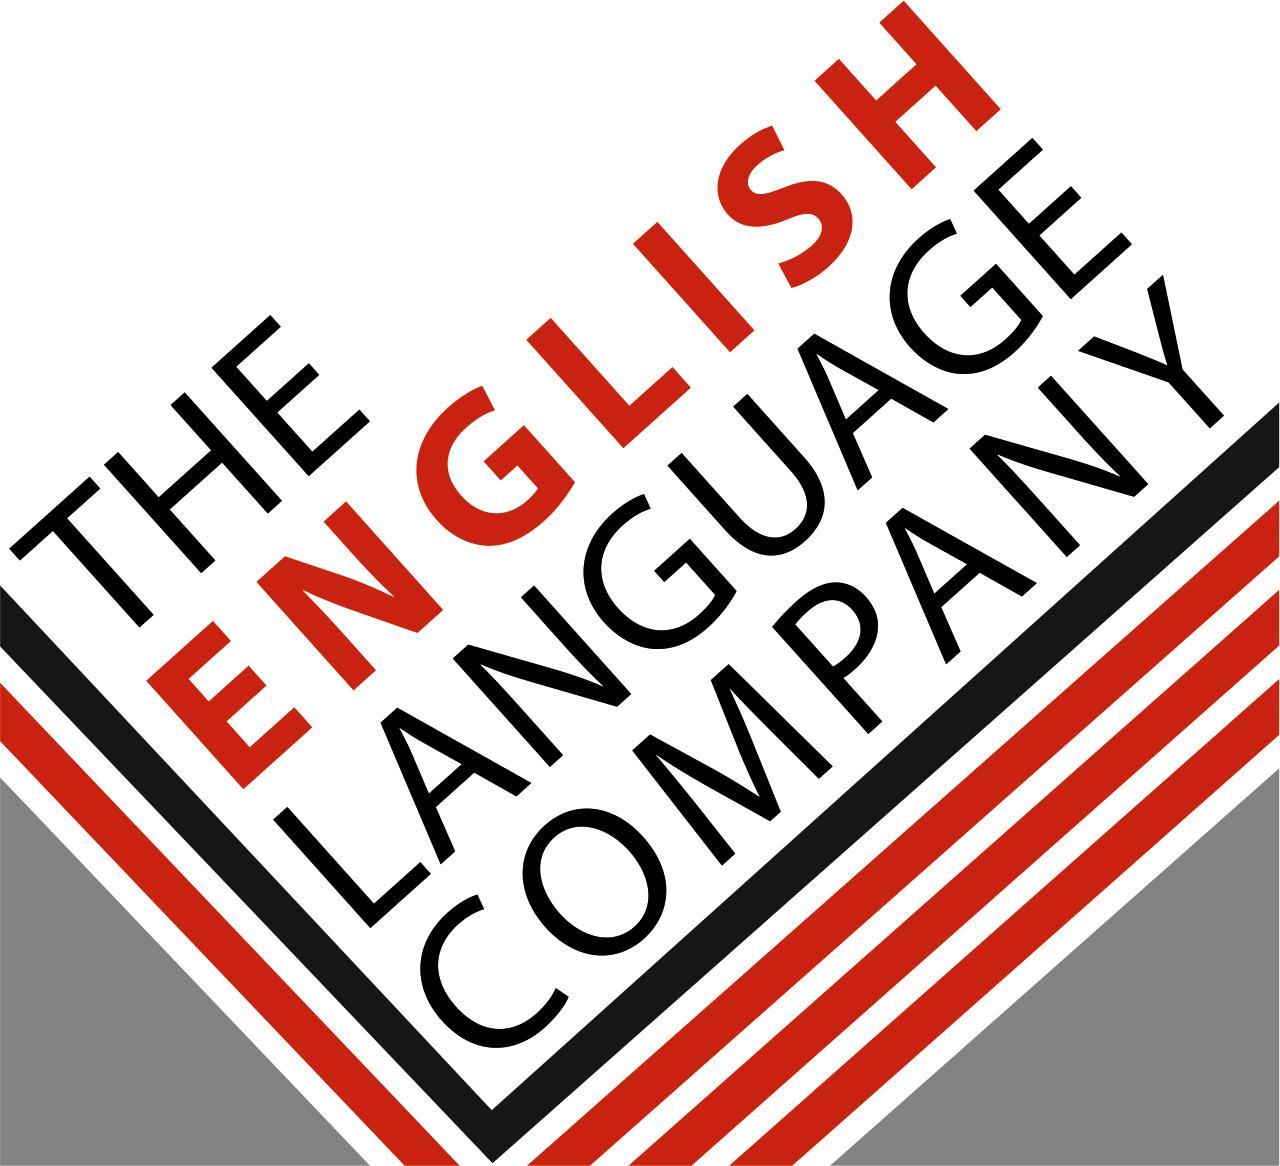 Wort-/Bildmarke: THE ENGLISH LANGUAGE COMPANY